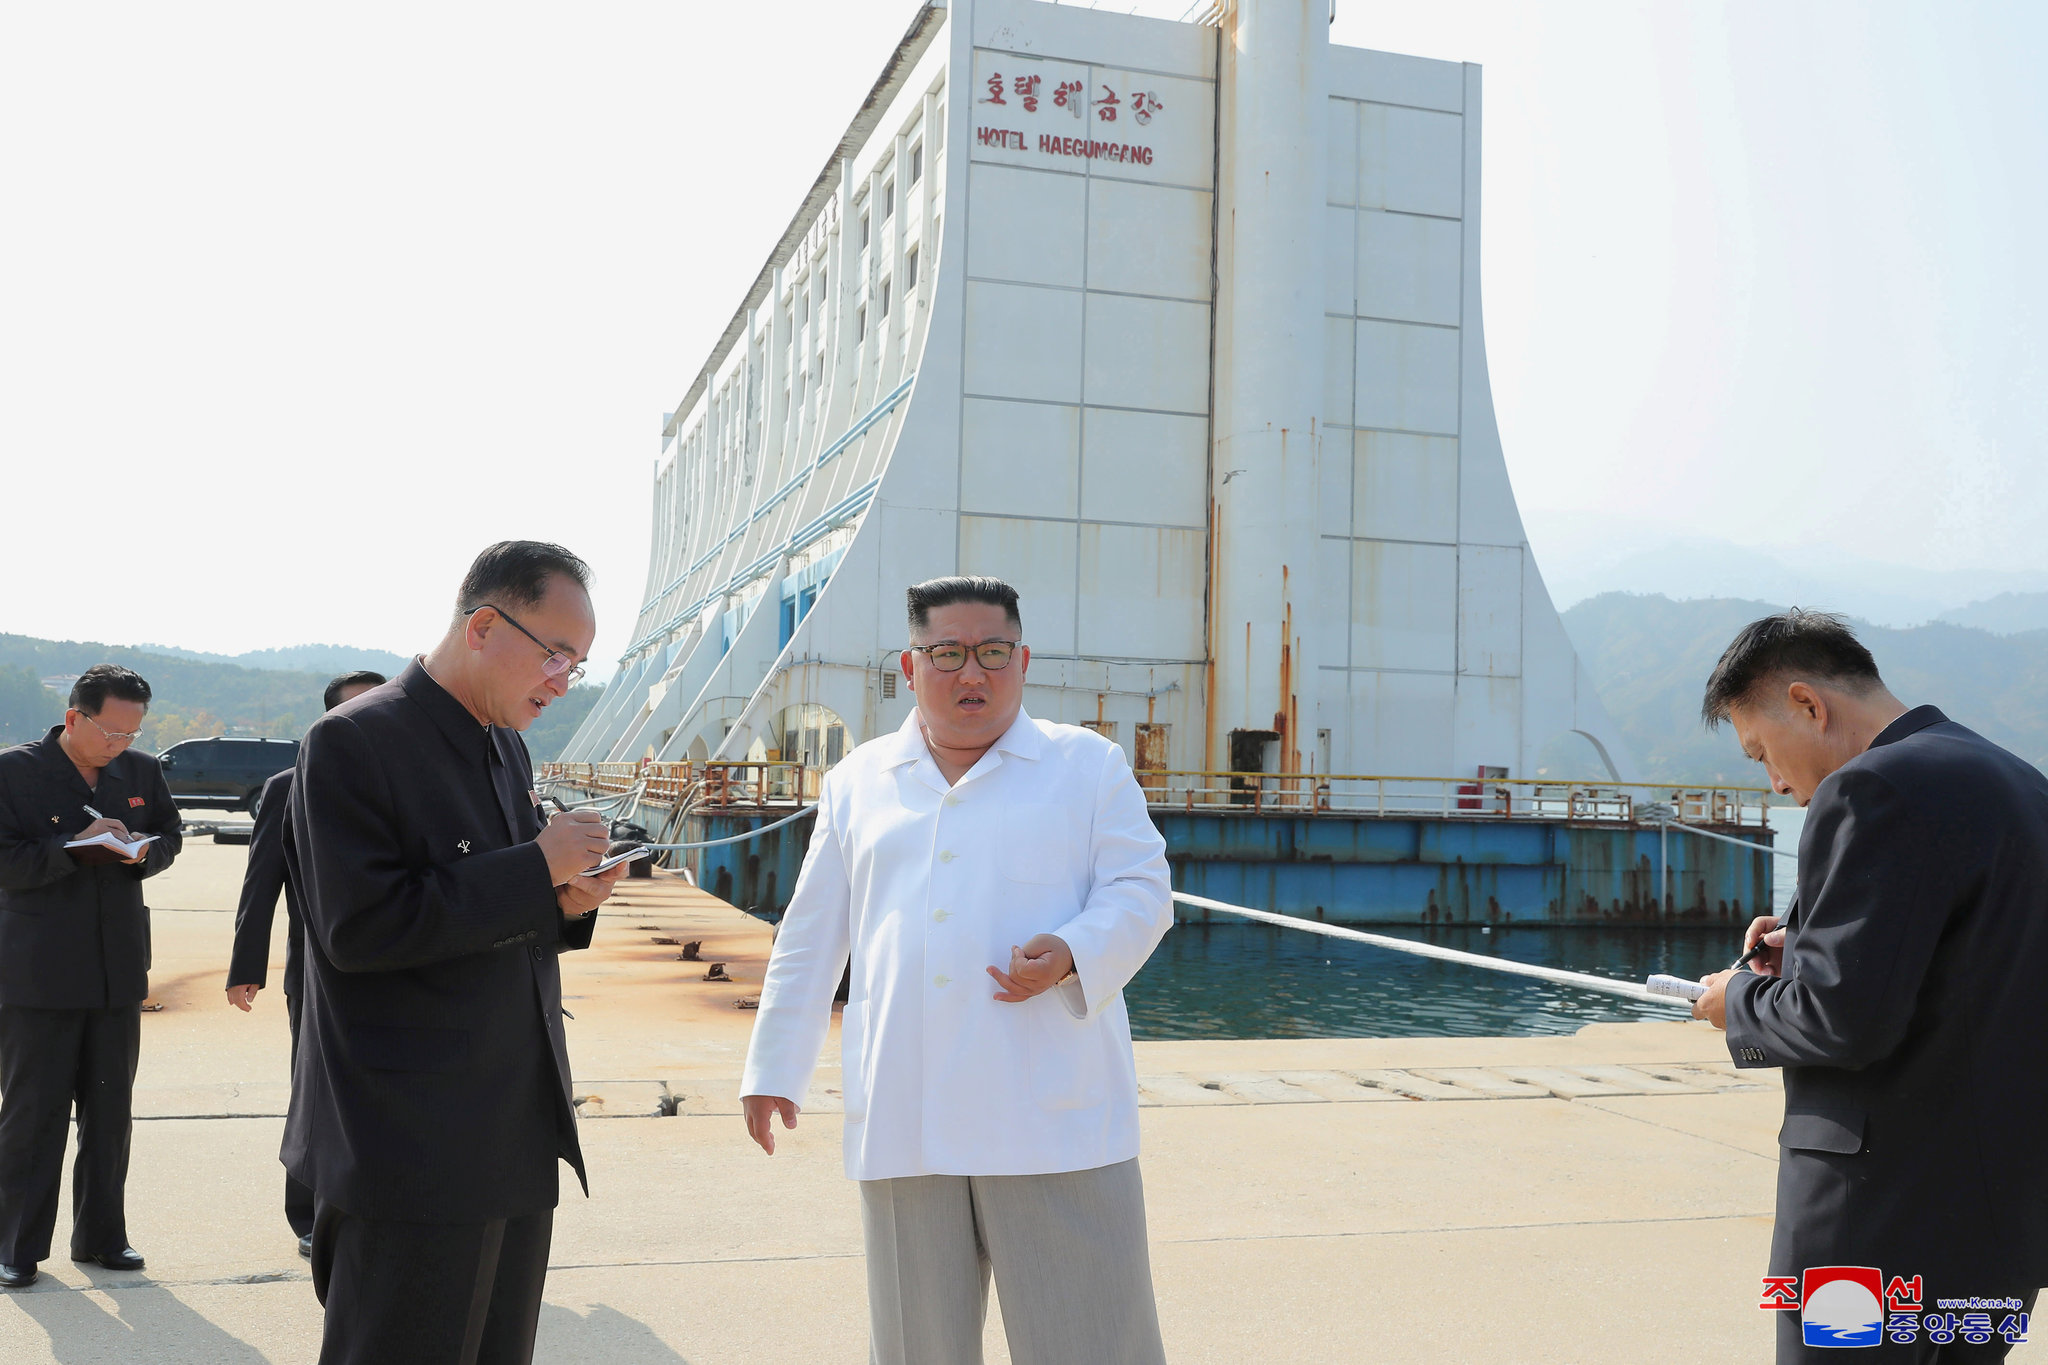 Kim Jong Un Orders Shabby South Korean Hotels In Resort